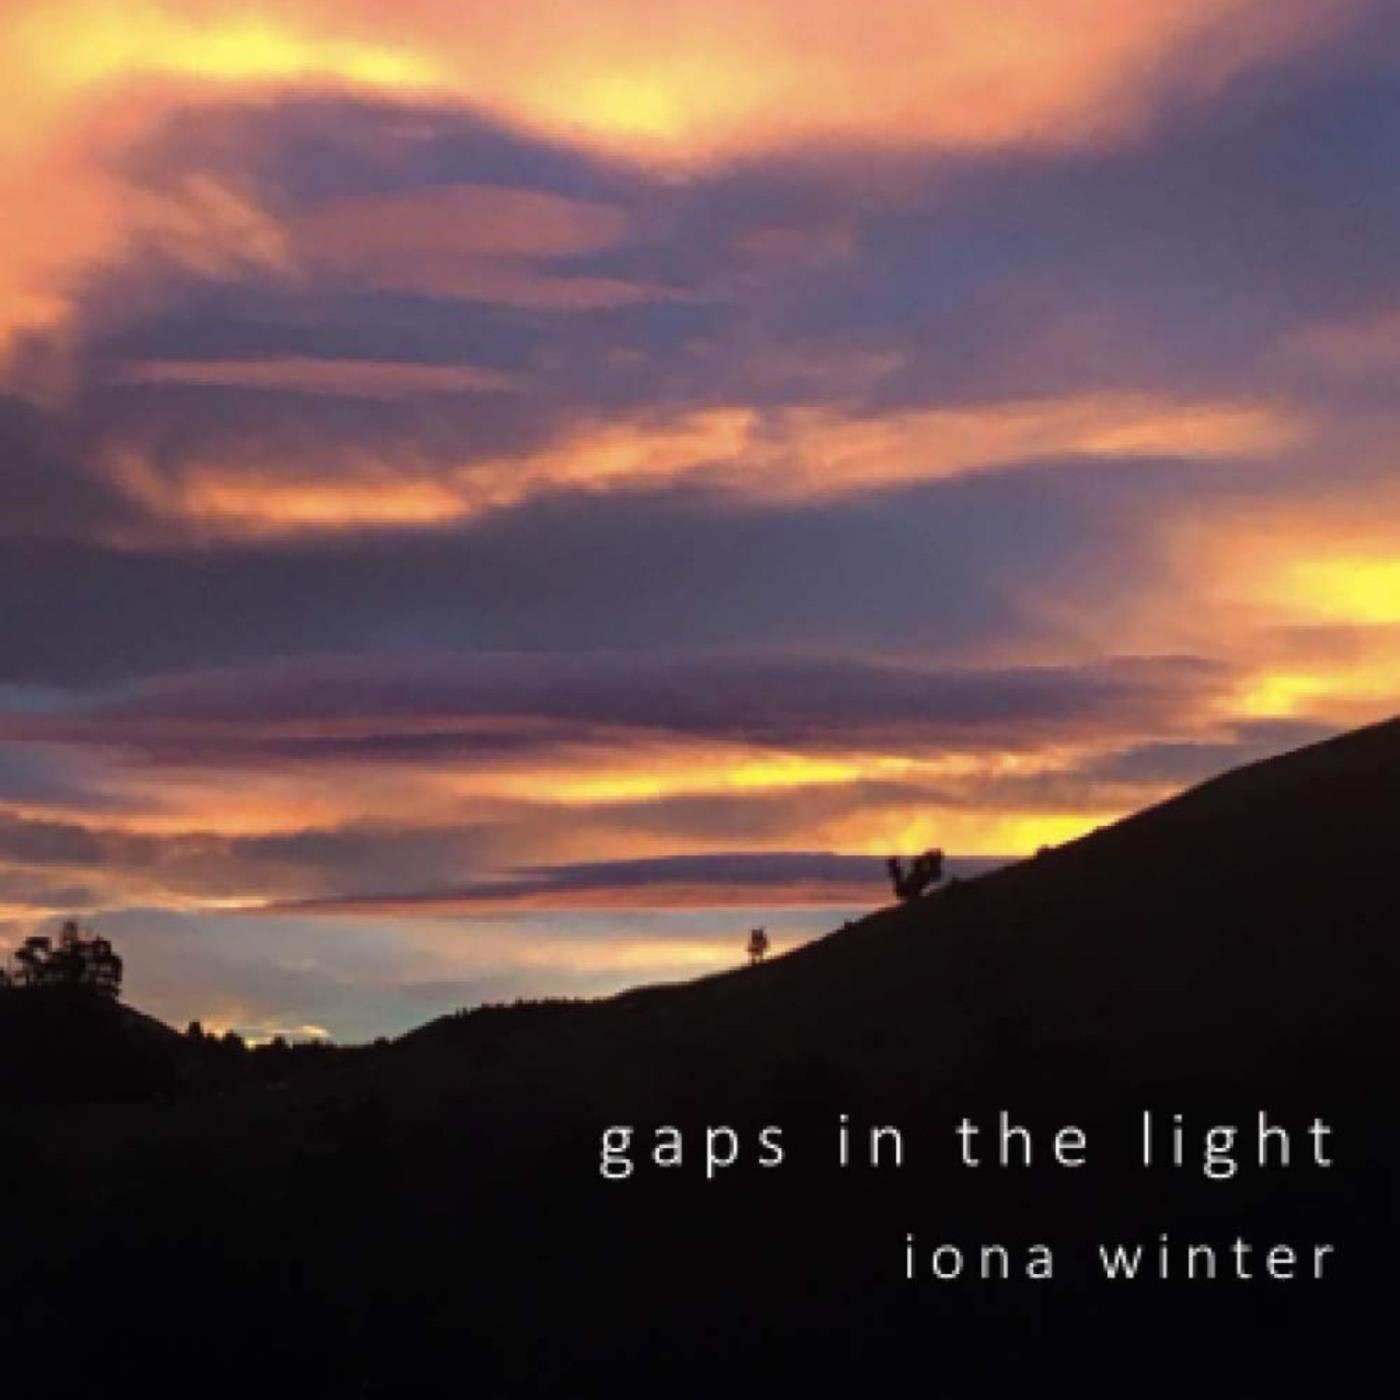 Gaps in the Light